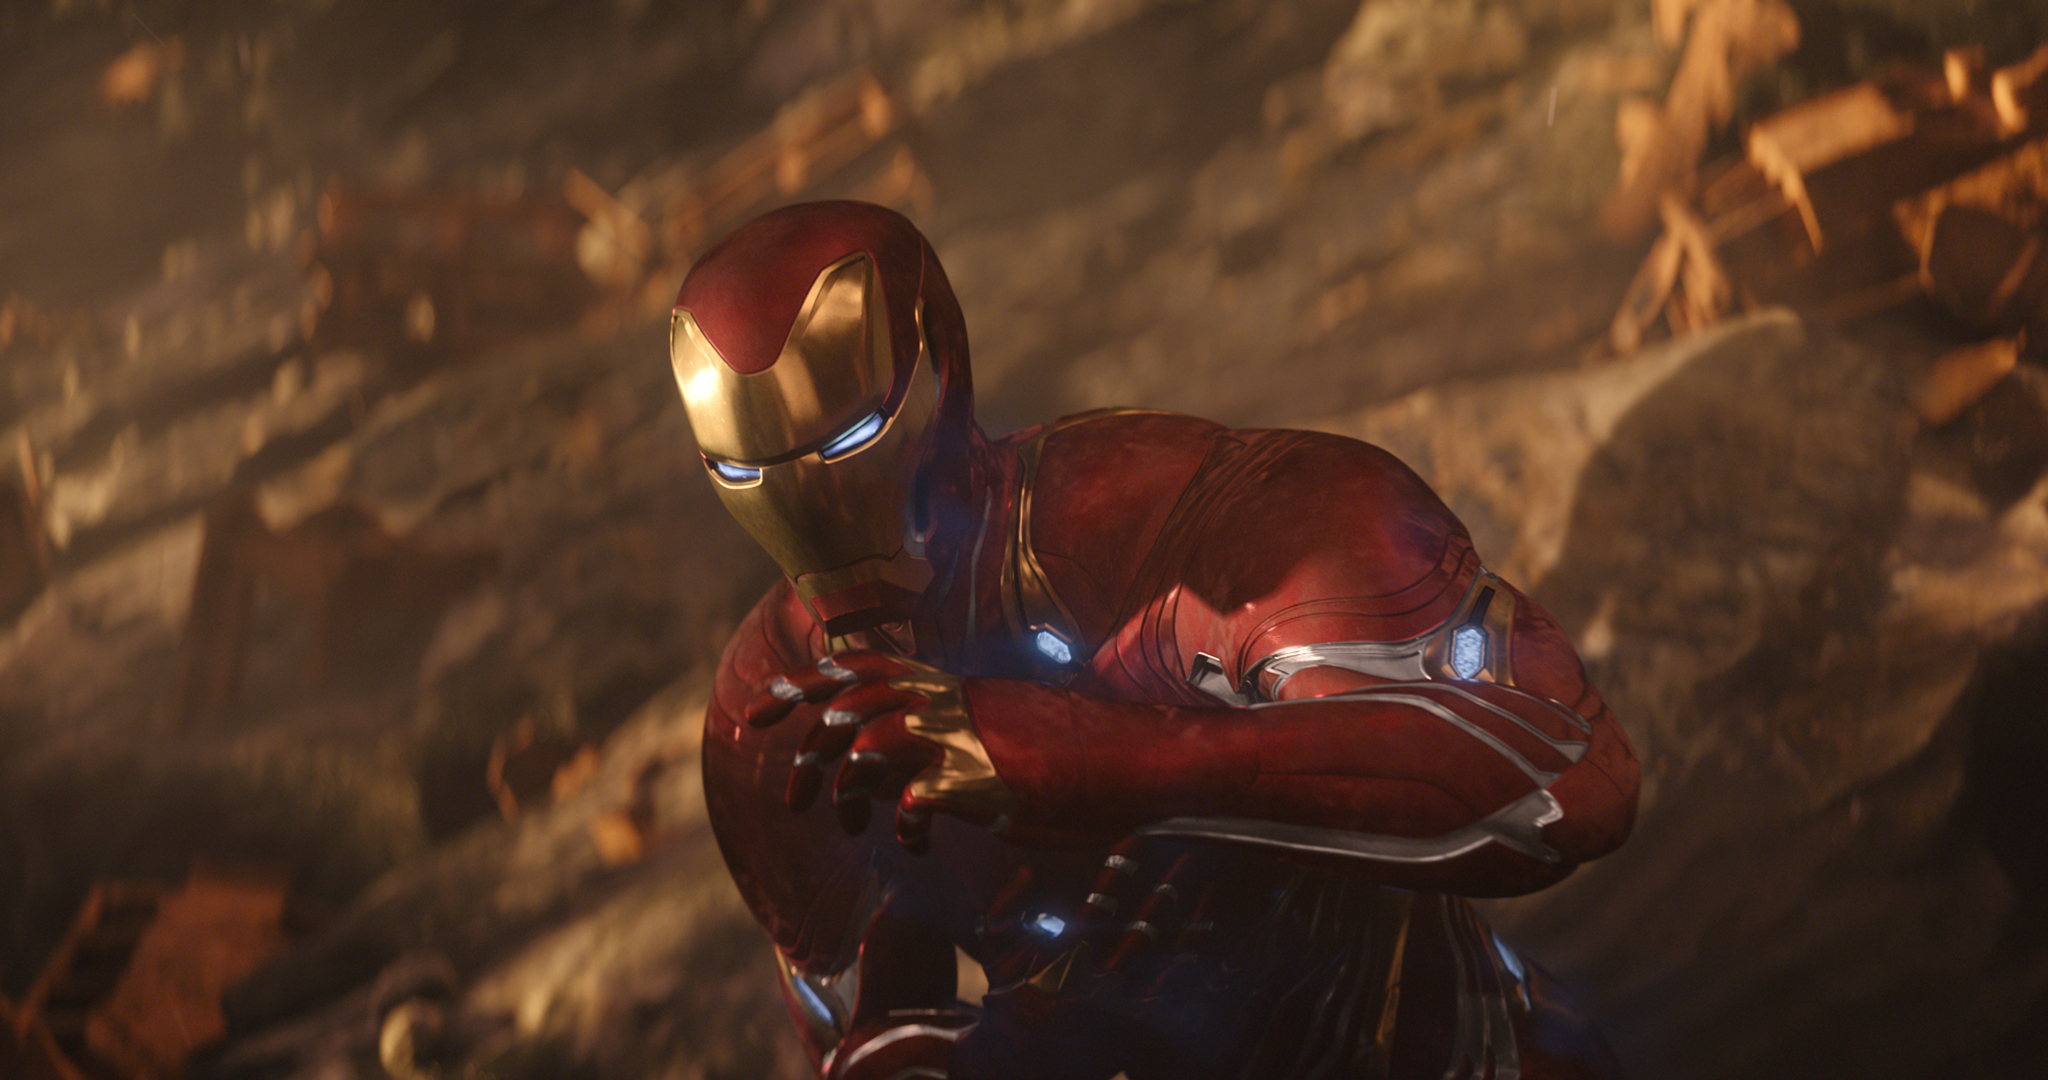 Marvel Studios' AVENGERS: INFINITY WAR Iron Man (Robert Downey Jr.) Photo: Film Frame ©Marvel Studios 2018